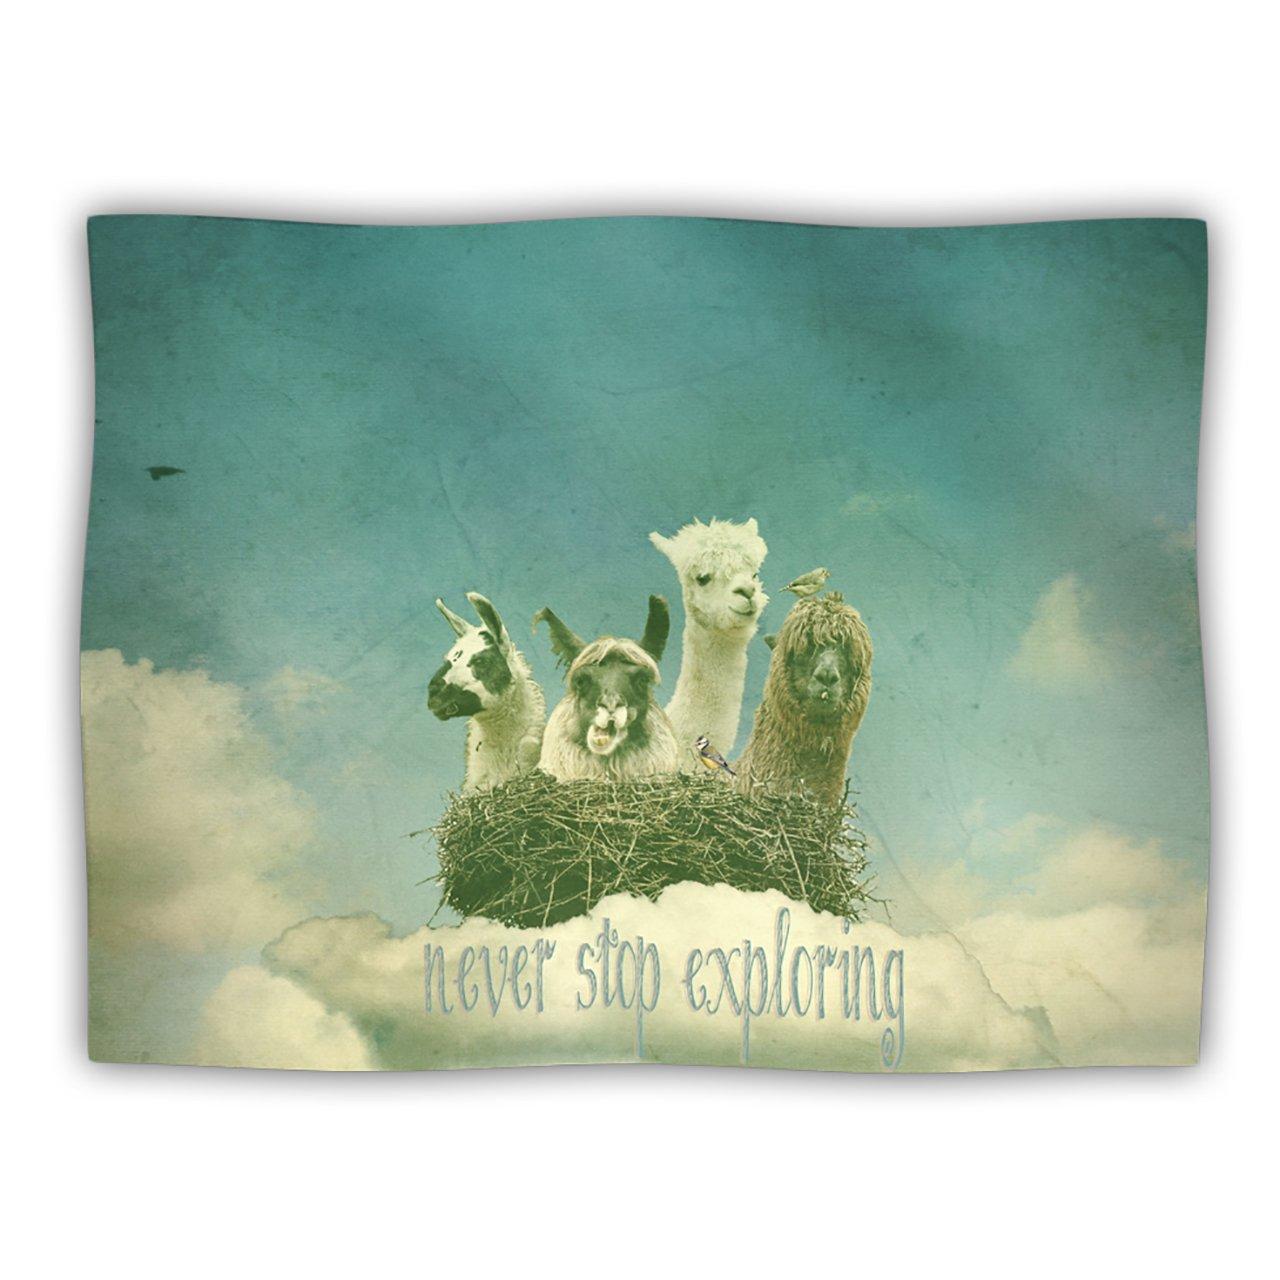 Kess InHouse Monika Strigel 'Never Stop Exploring' Dog Blanket, 40 by 30-Inch